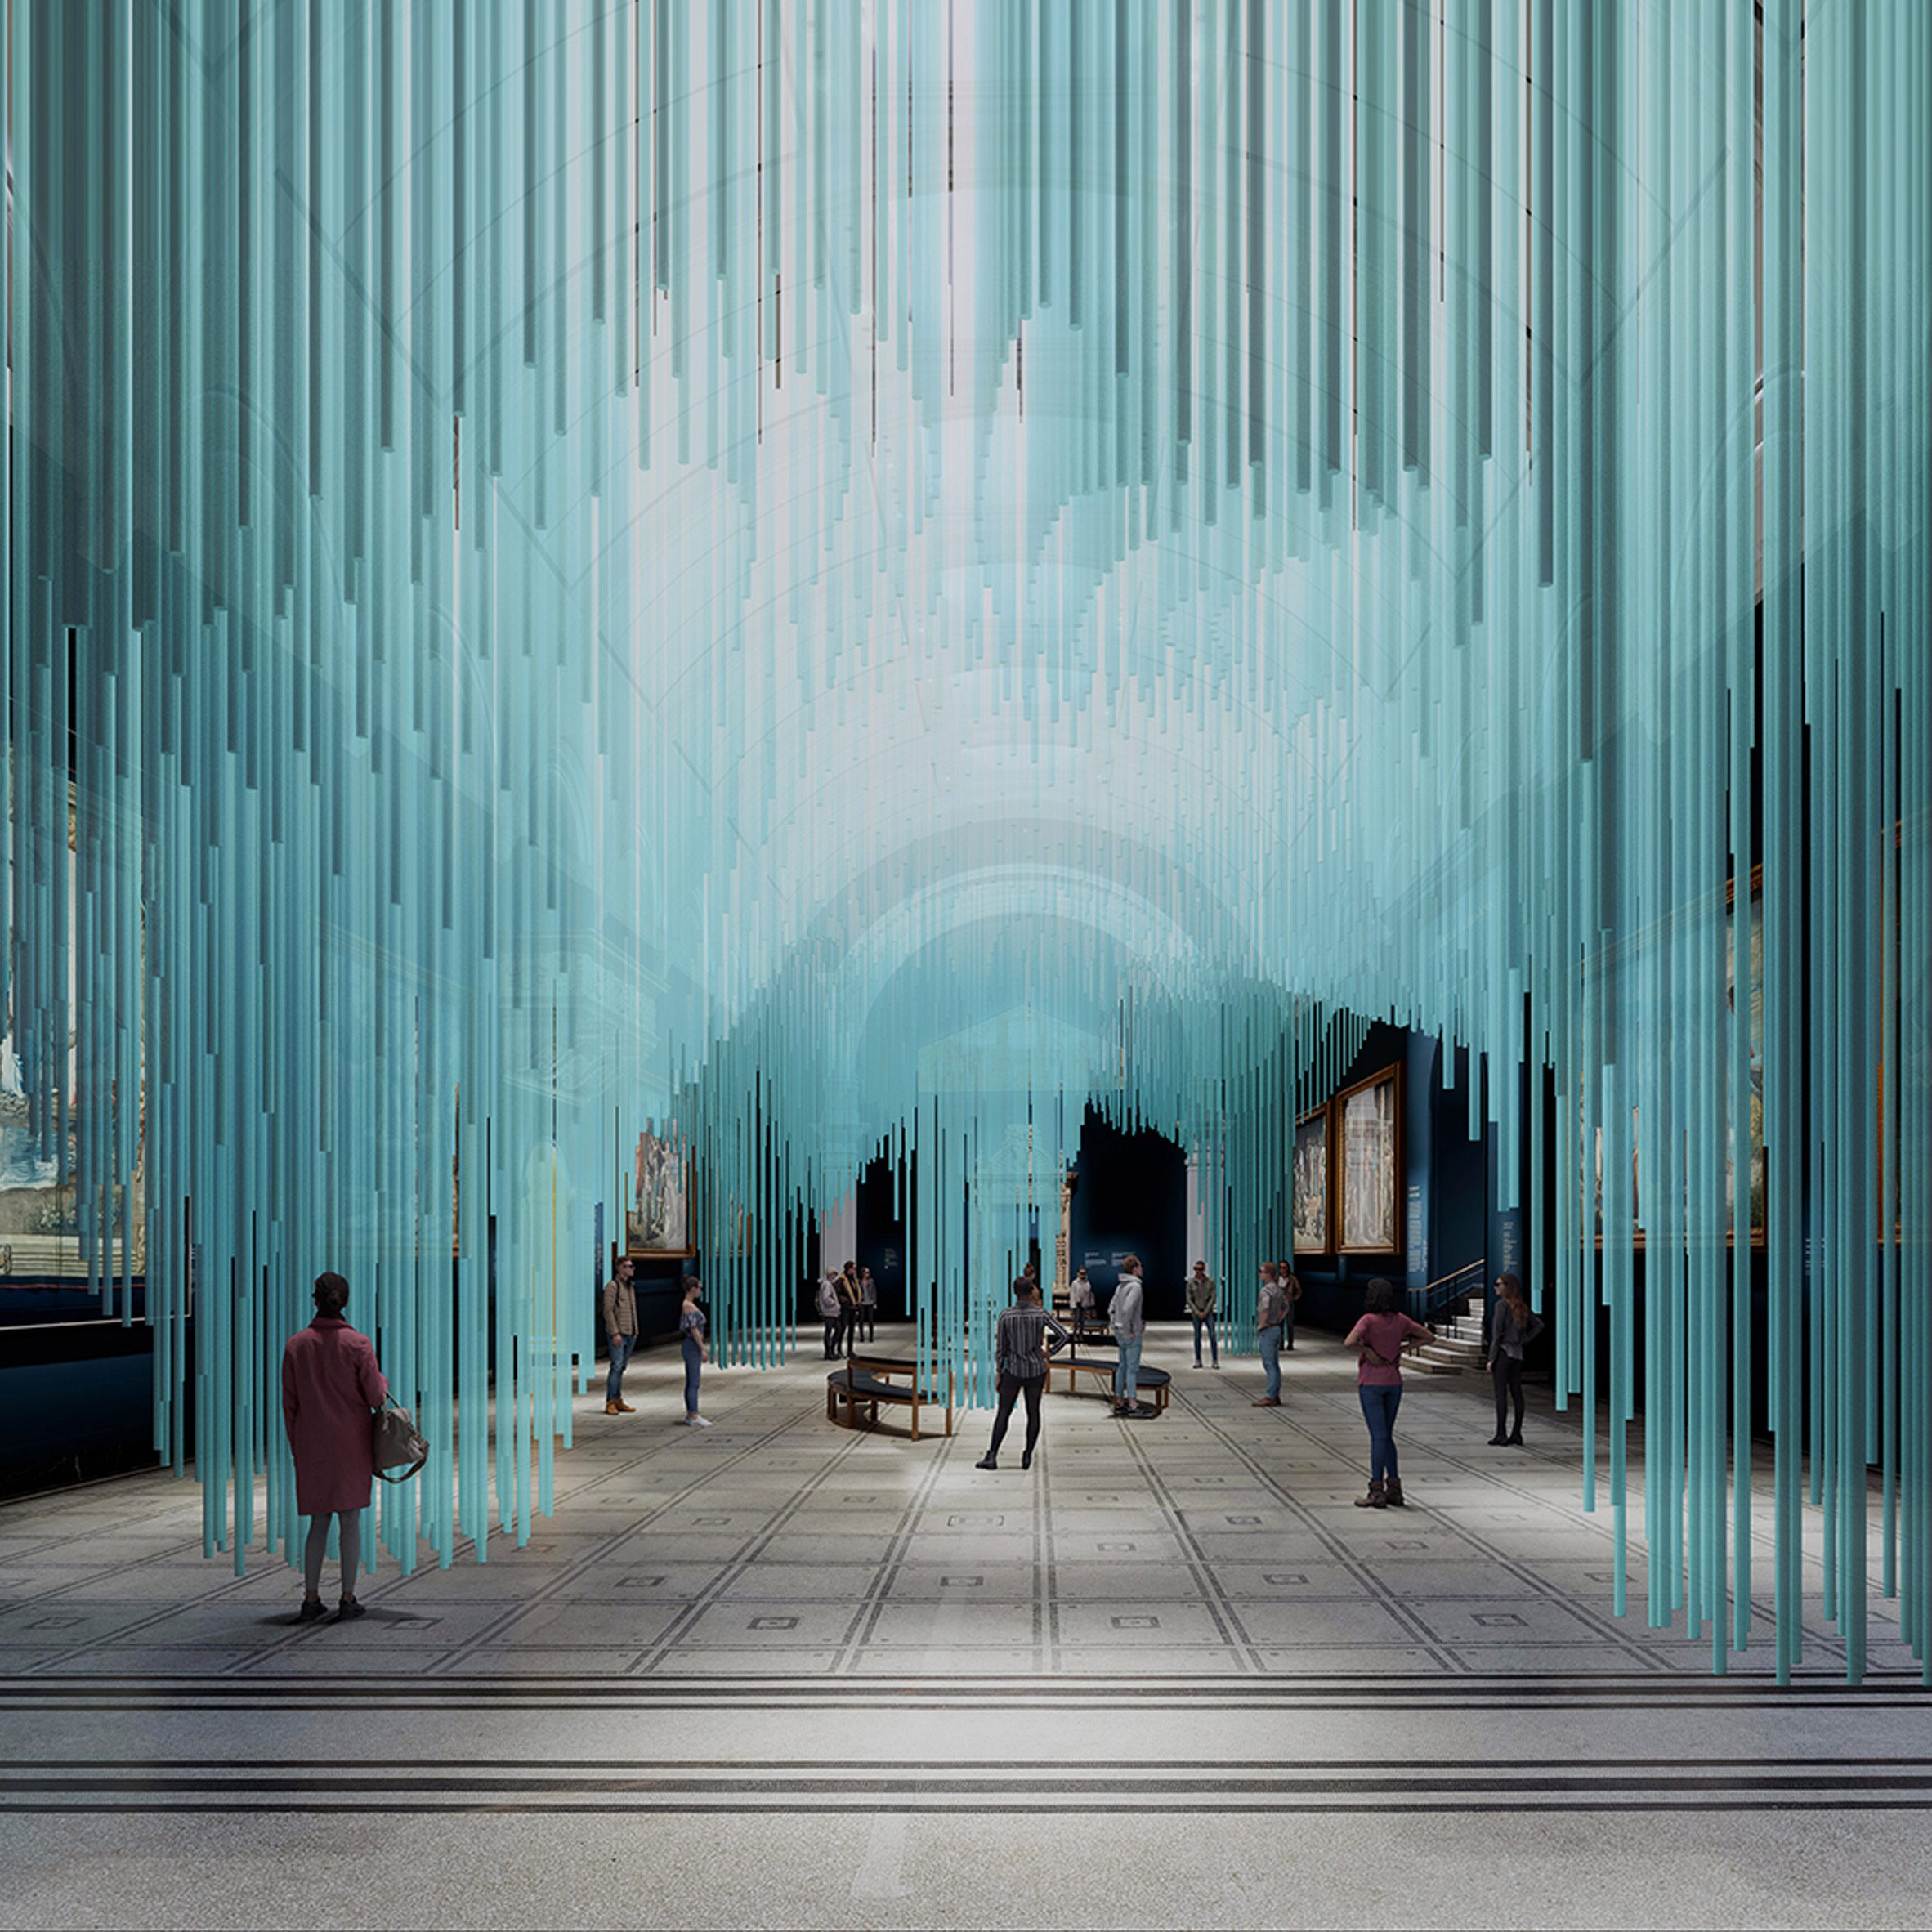 Visitors walking through a blue light installation